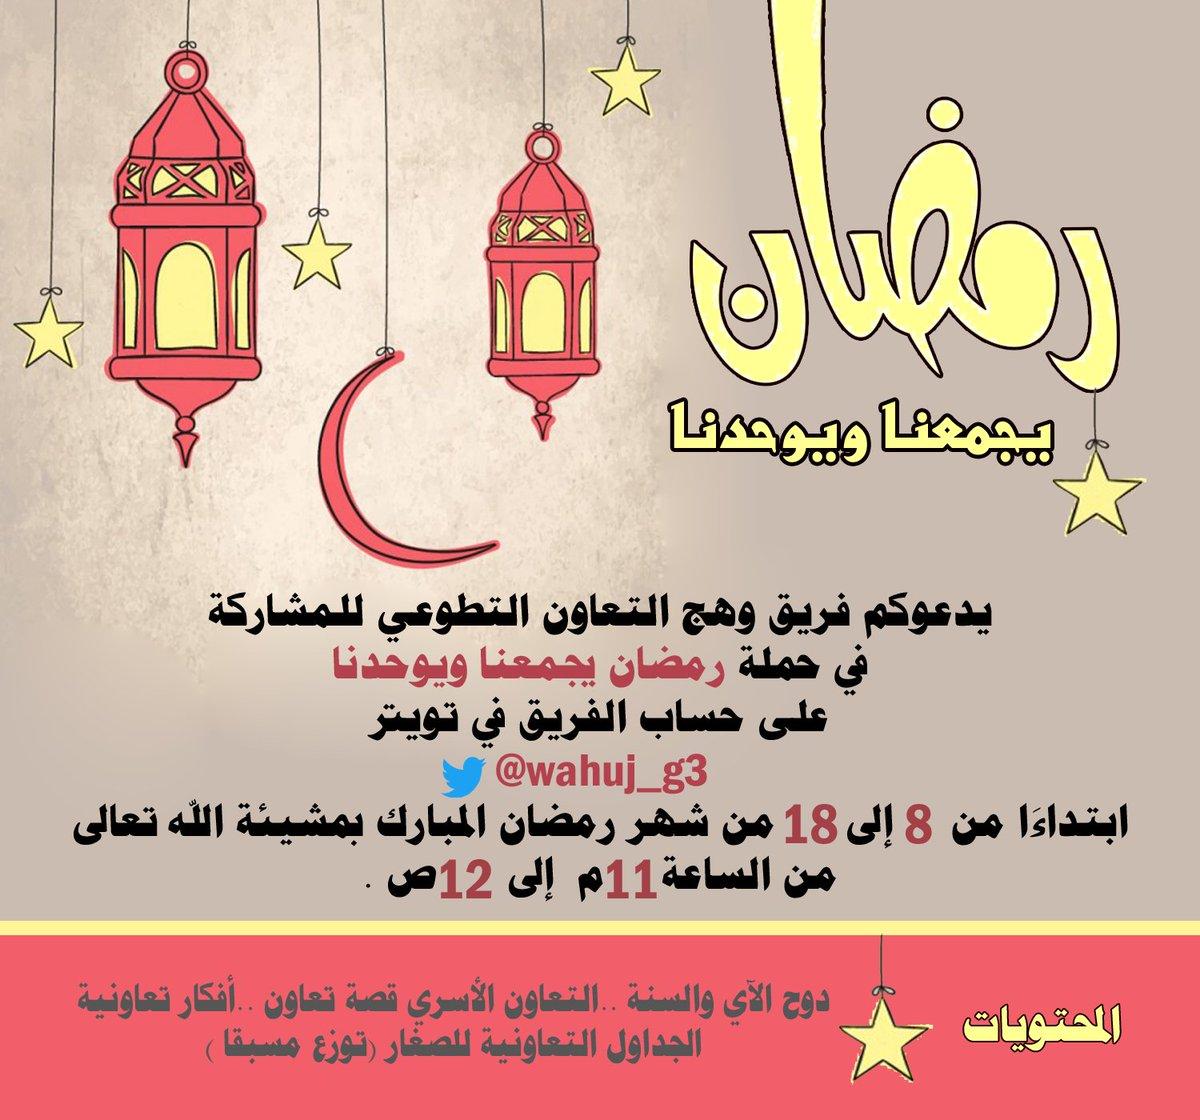 رمضان فرصة للتطوع Hashtag On Twitter